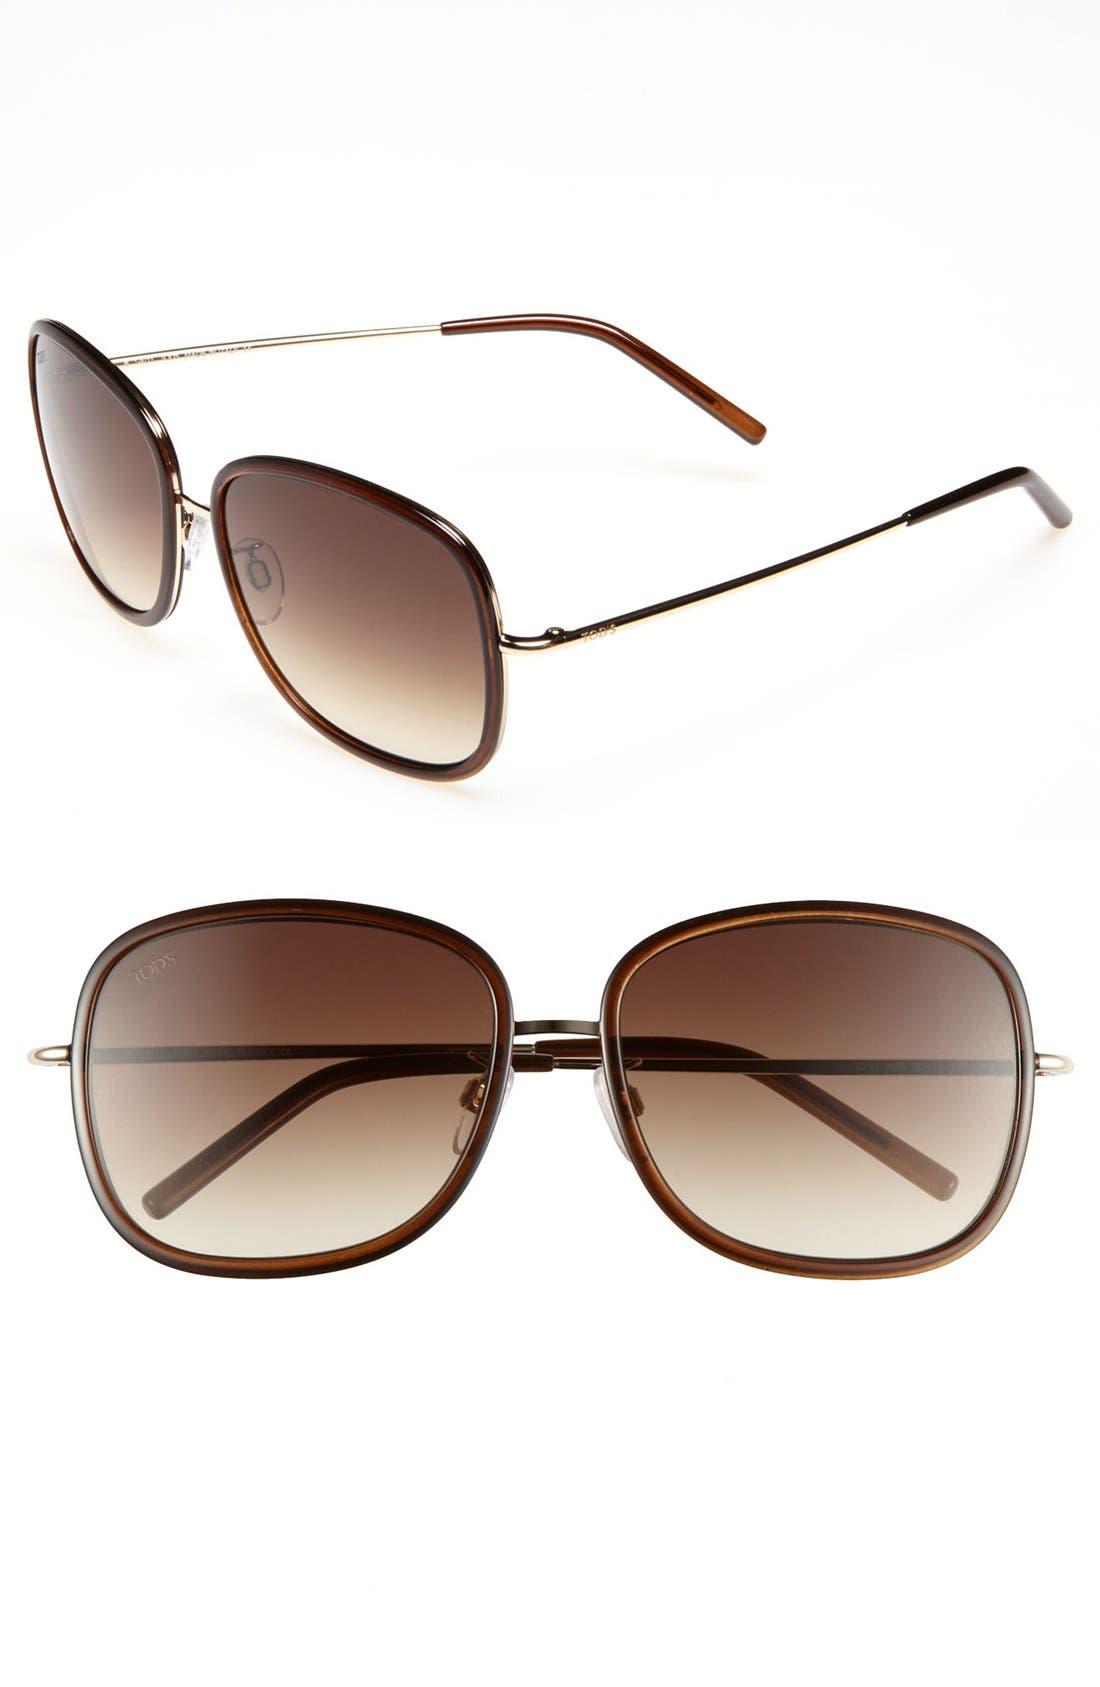 Alternate Image 1 Selected - Tod's 'Sung' 58mm Metal Aviator Sunglasses